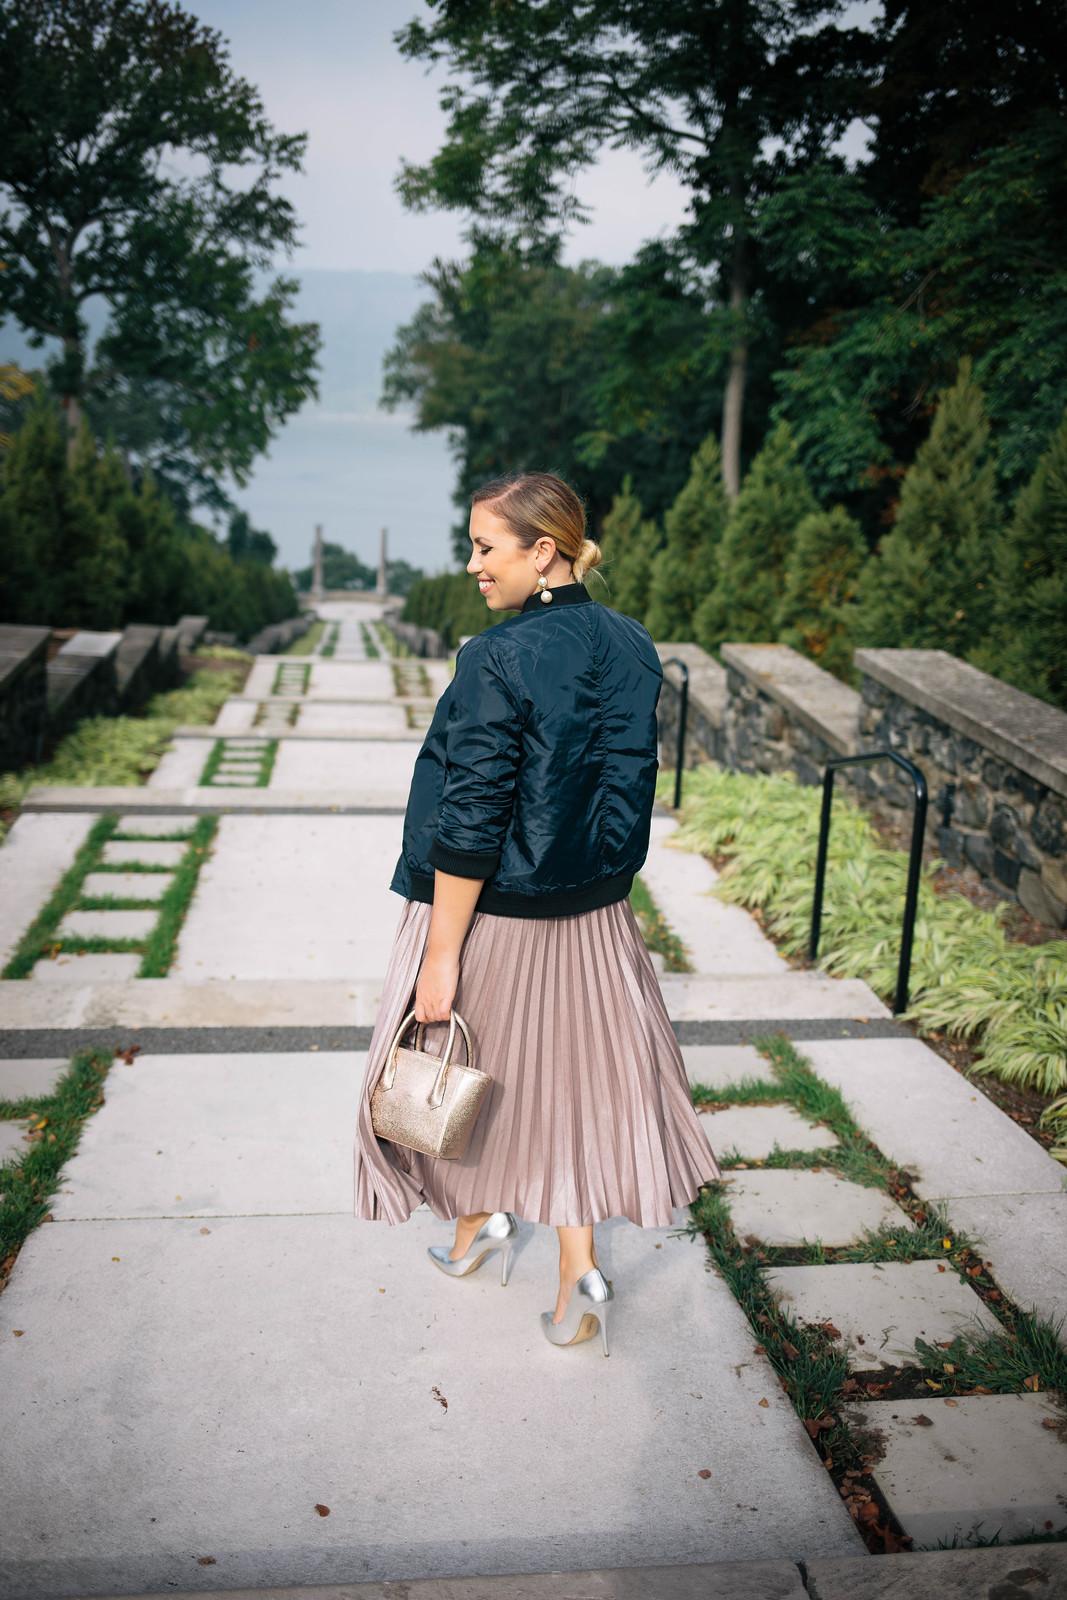 Navy Bomber Jacket   Metallic Pleated Midi Skirt   Silver High Heels   Untermeyer Park & Gardens Yonkers NY